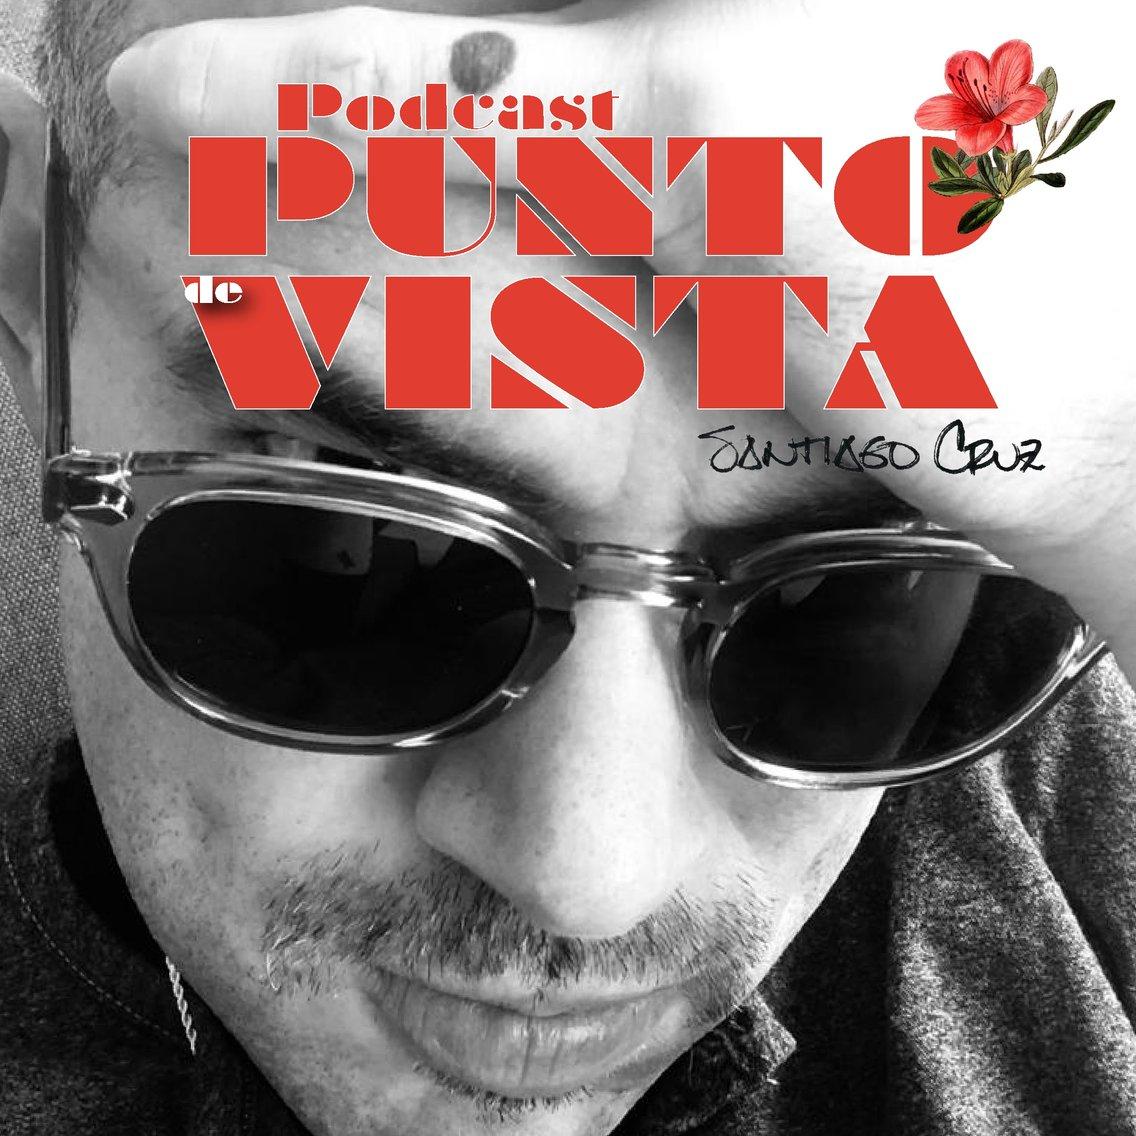 Punto de Vista - Cover Image